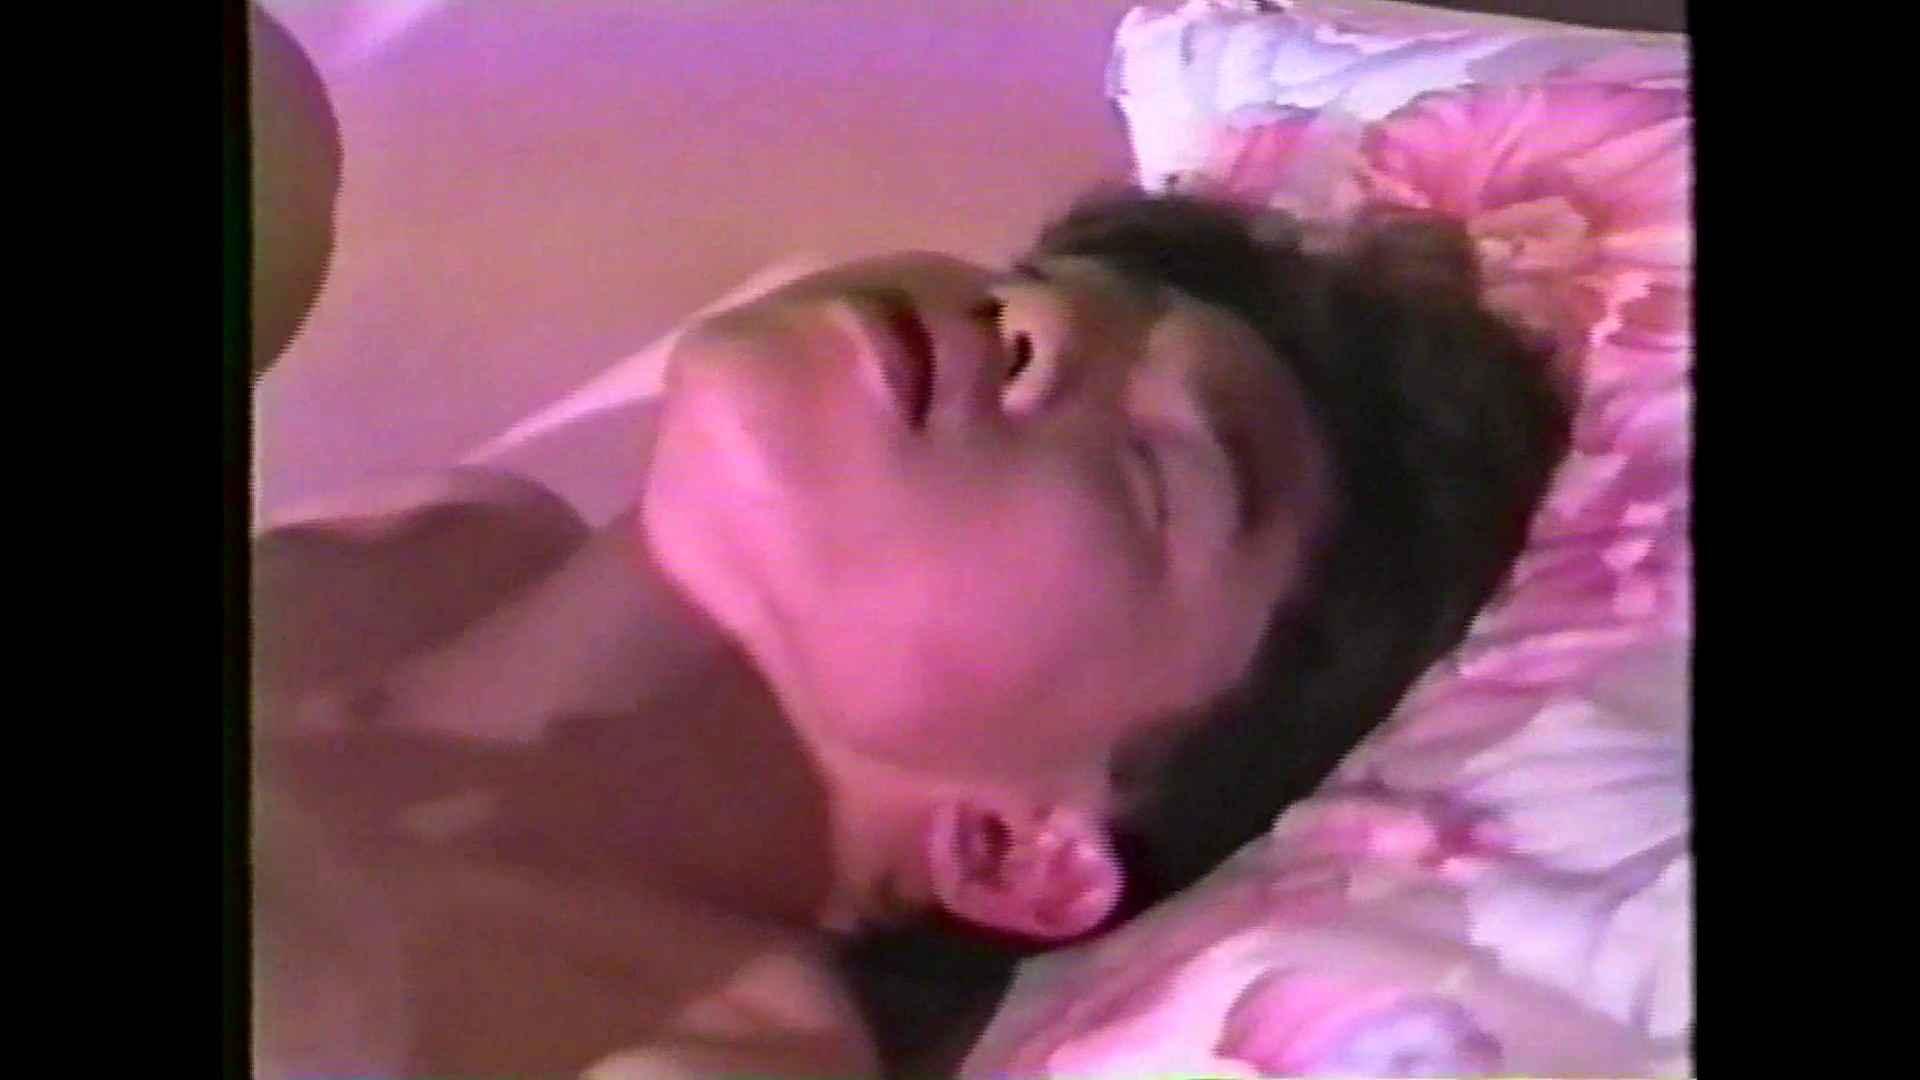 GAYBOY宏のオカズ倉庫Vol.2-1 ゲイのペニス ペニス画像 68枚 66